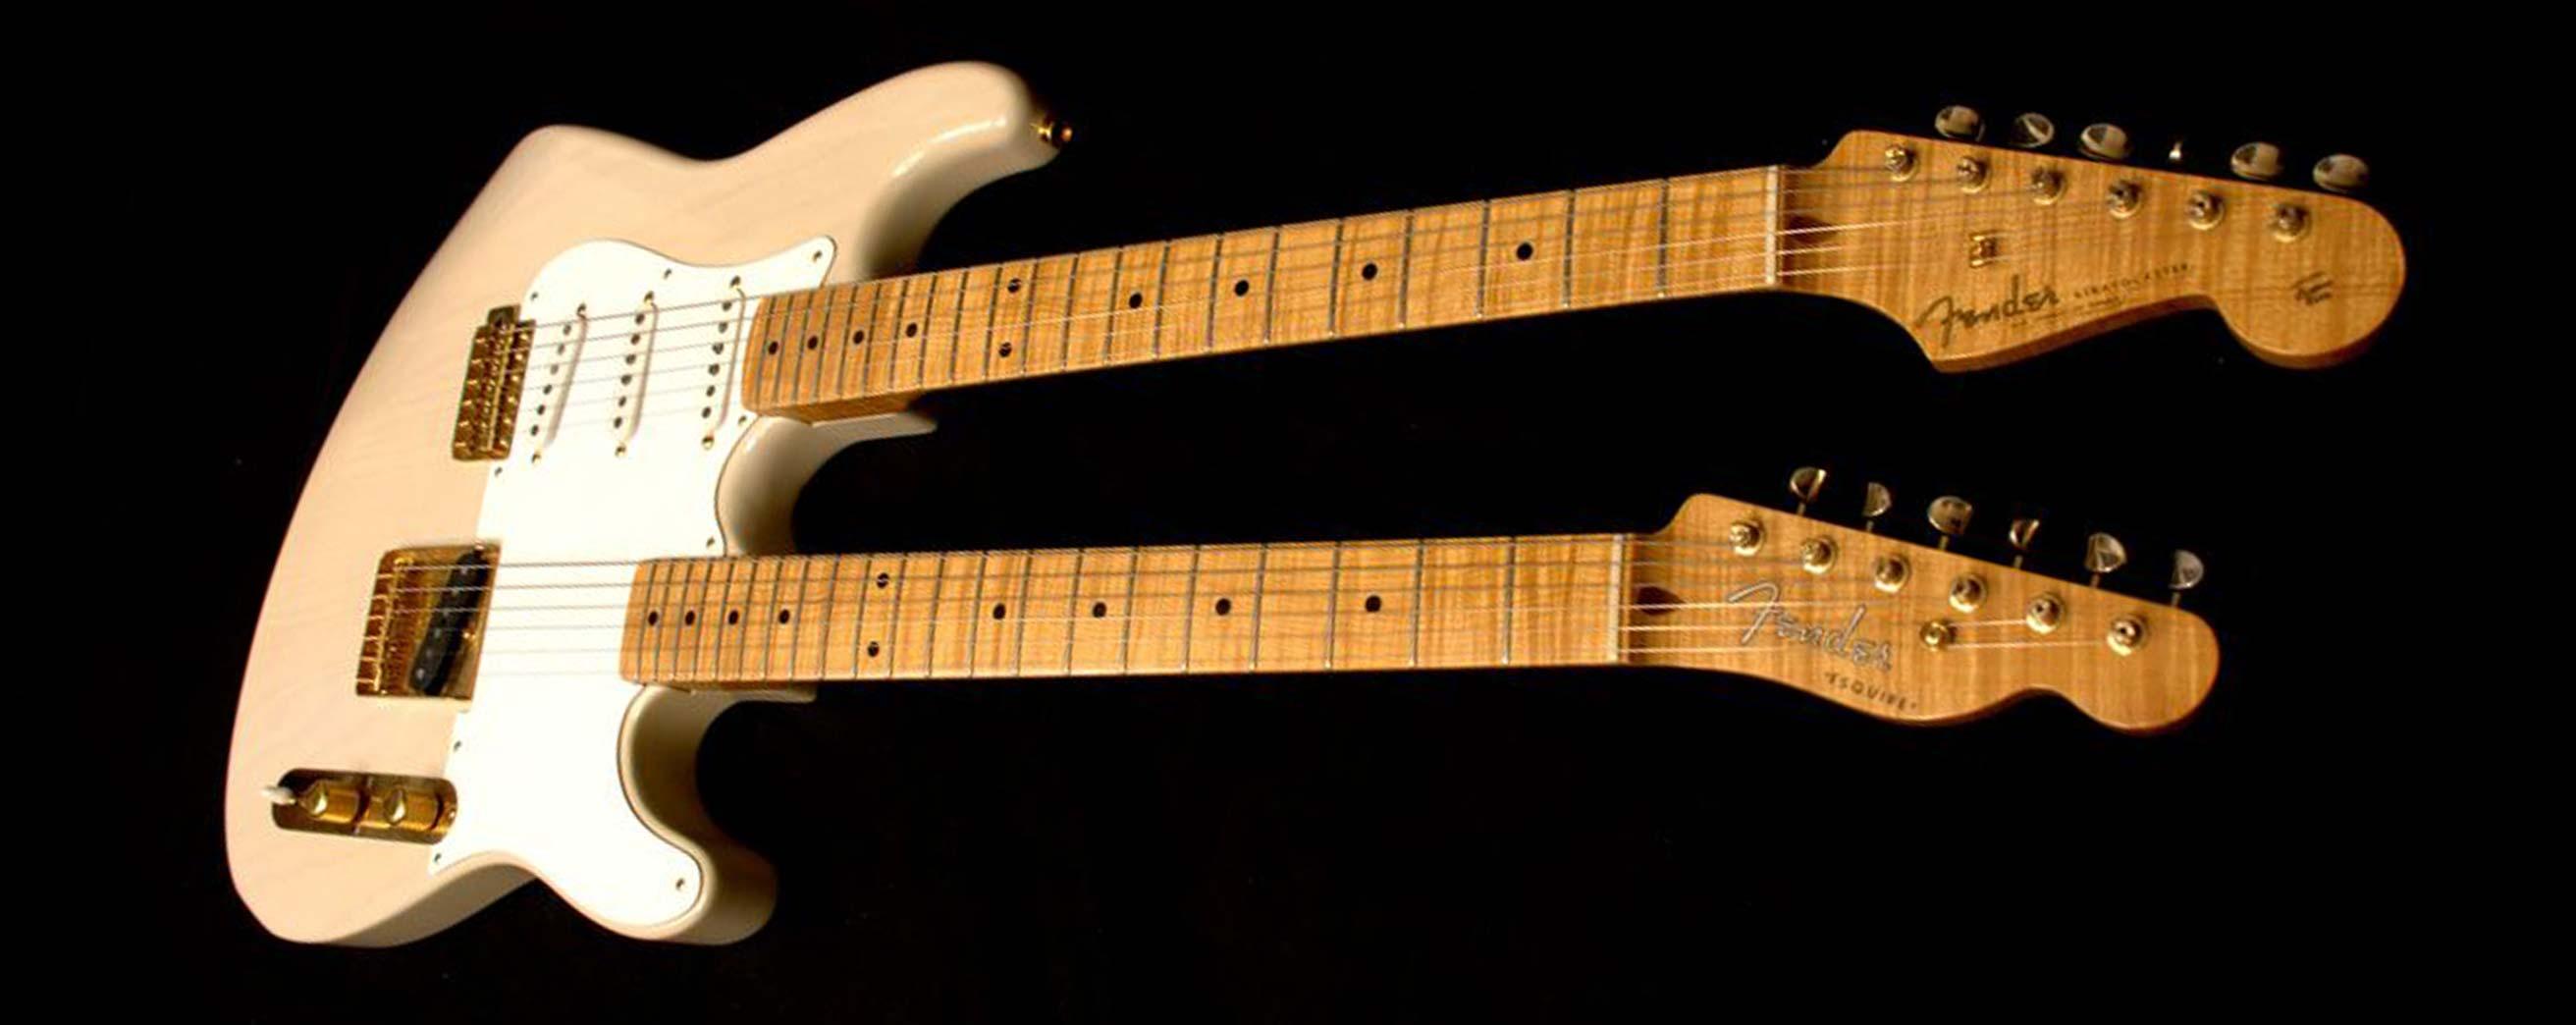 16318-first-custom-guitar-Hero.jpg